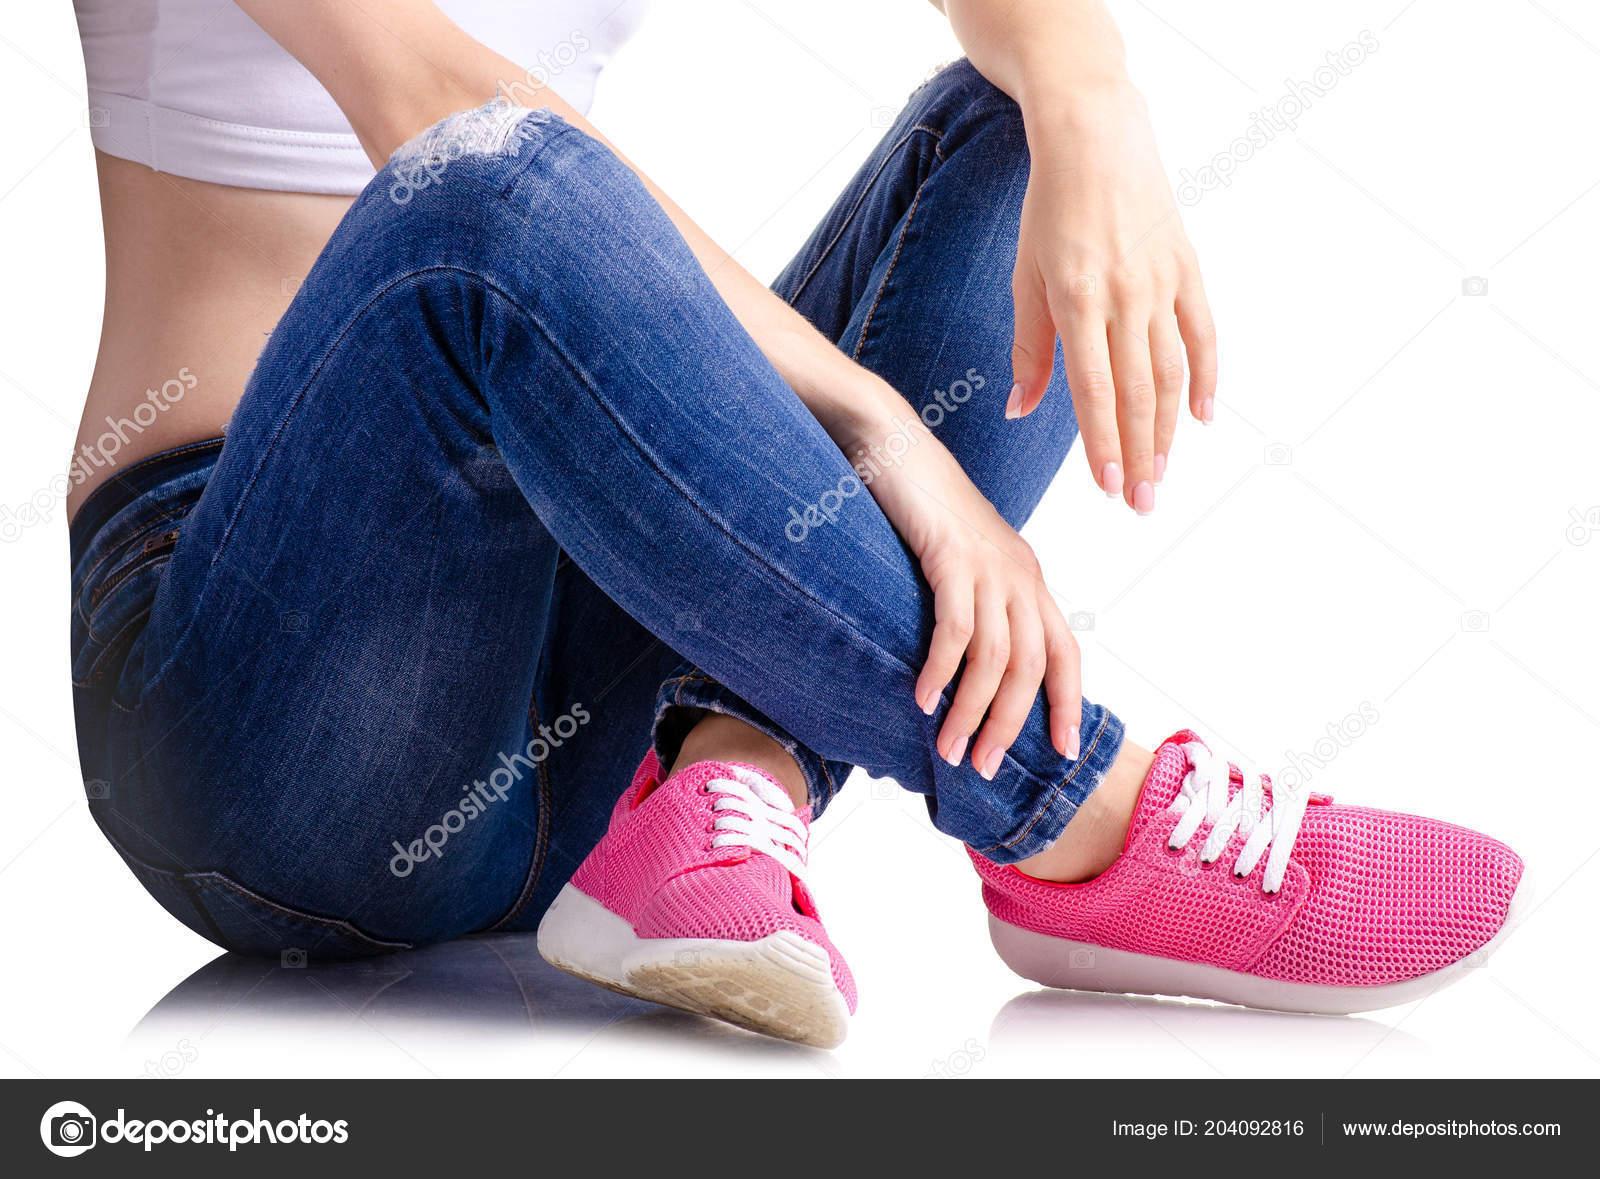 low priced f58fd 509ed depositphotos 204092816-stock-photo-woman-denim-sneakers.jpg